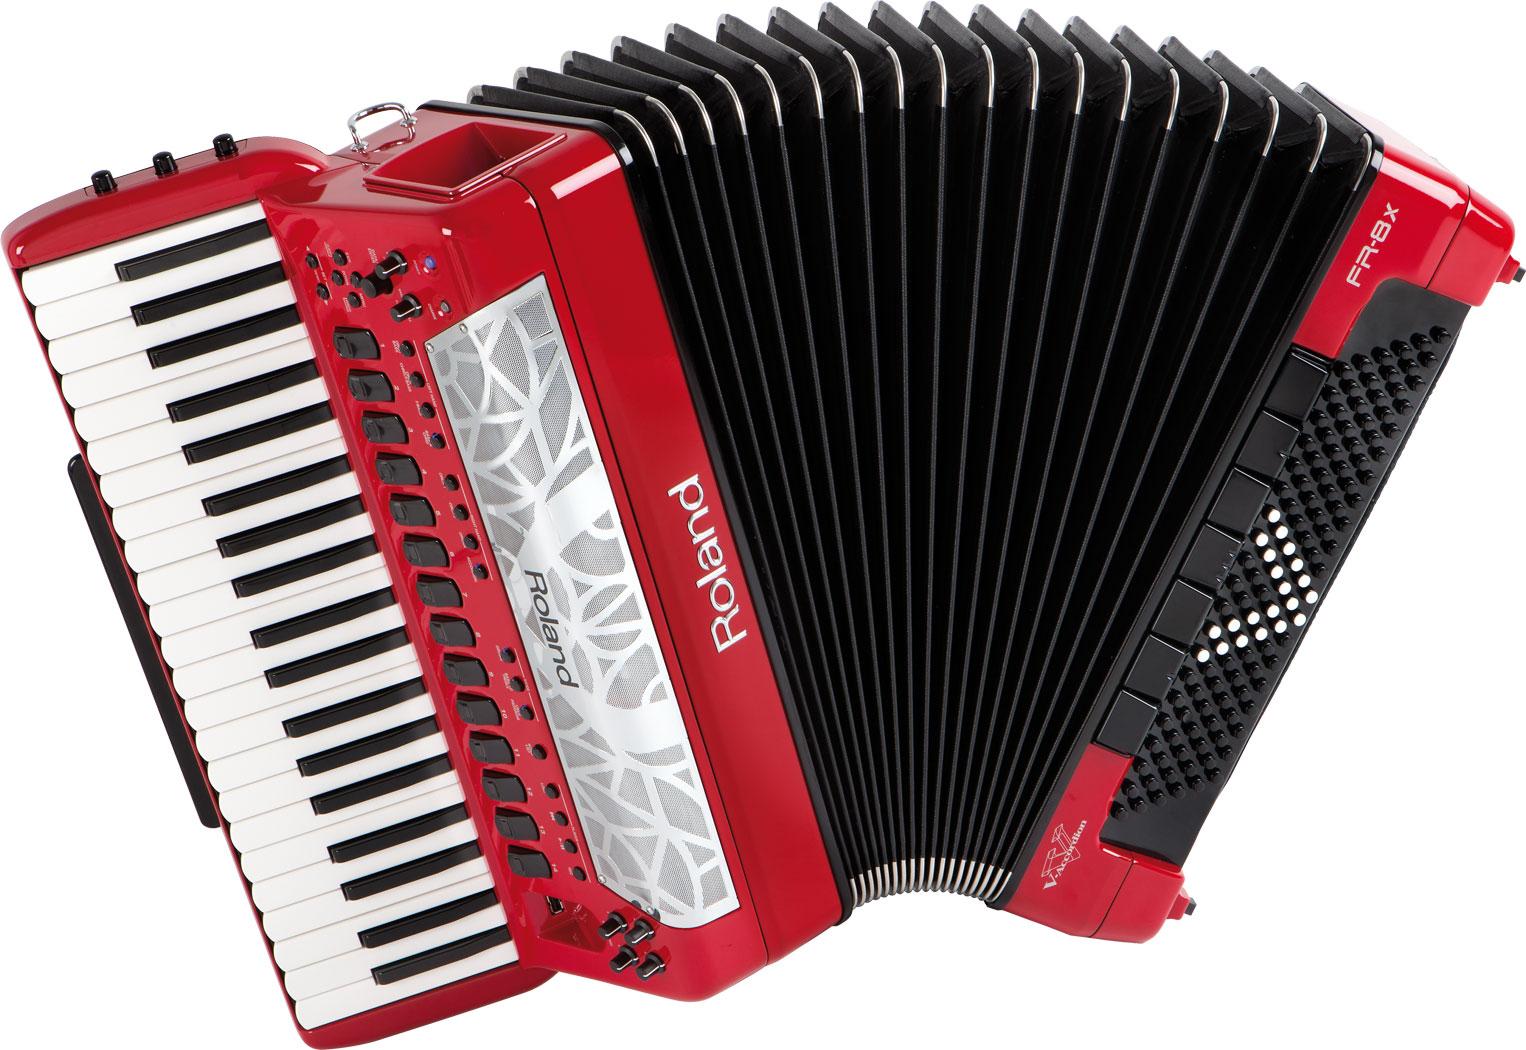 Accordéons - ACCORDEONS - ROLAND - Accordéon FR-8x rouge - Royez Musik